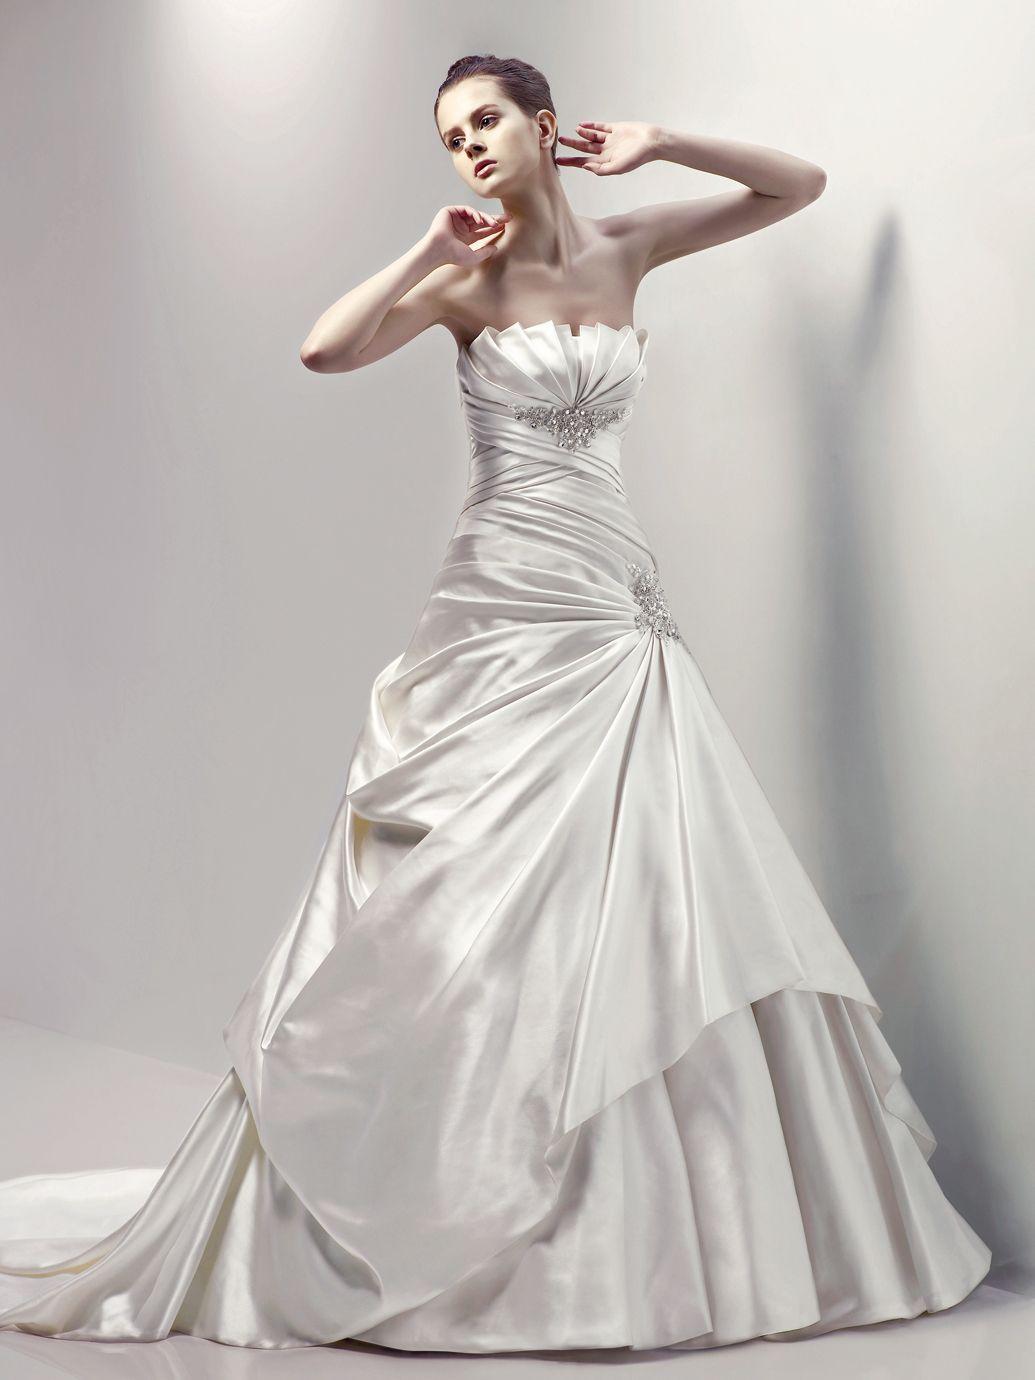 Calistoga Blue Collection Enzoani Available Colours Diamond White Ivory Bridal